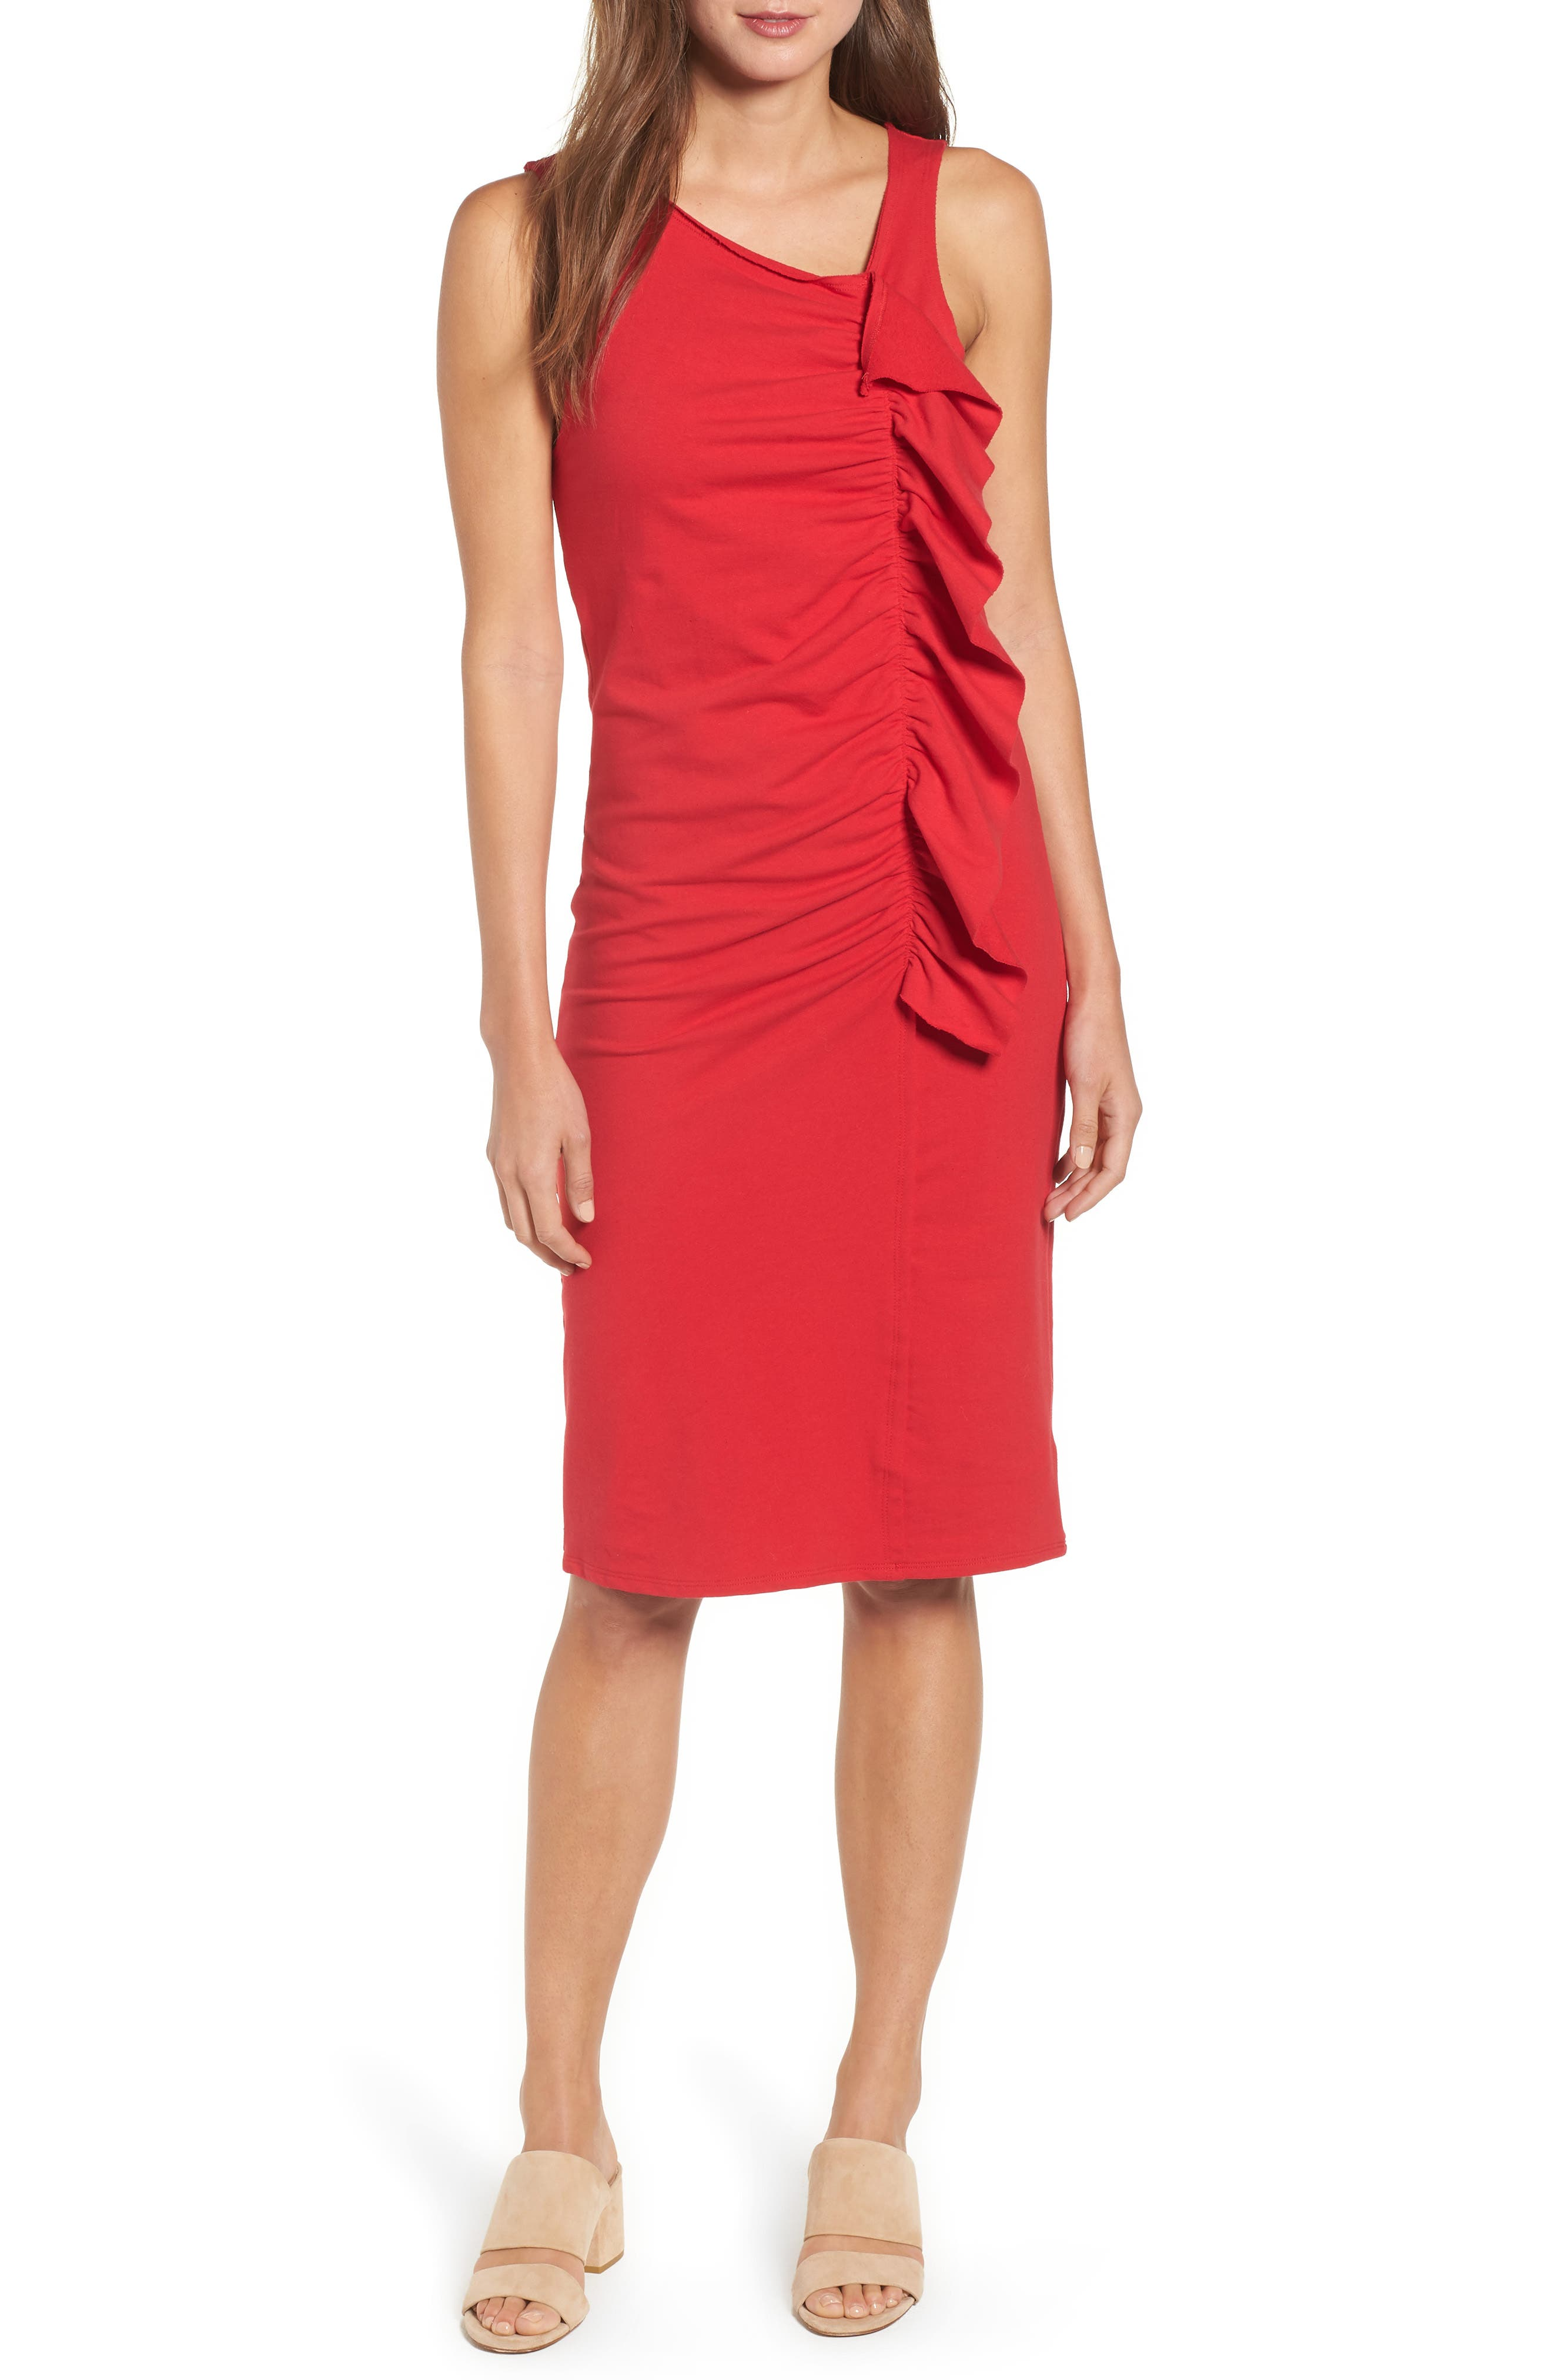 Bobeau French Terry Ruffle Front Dress